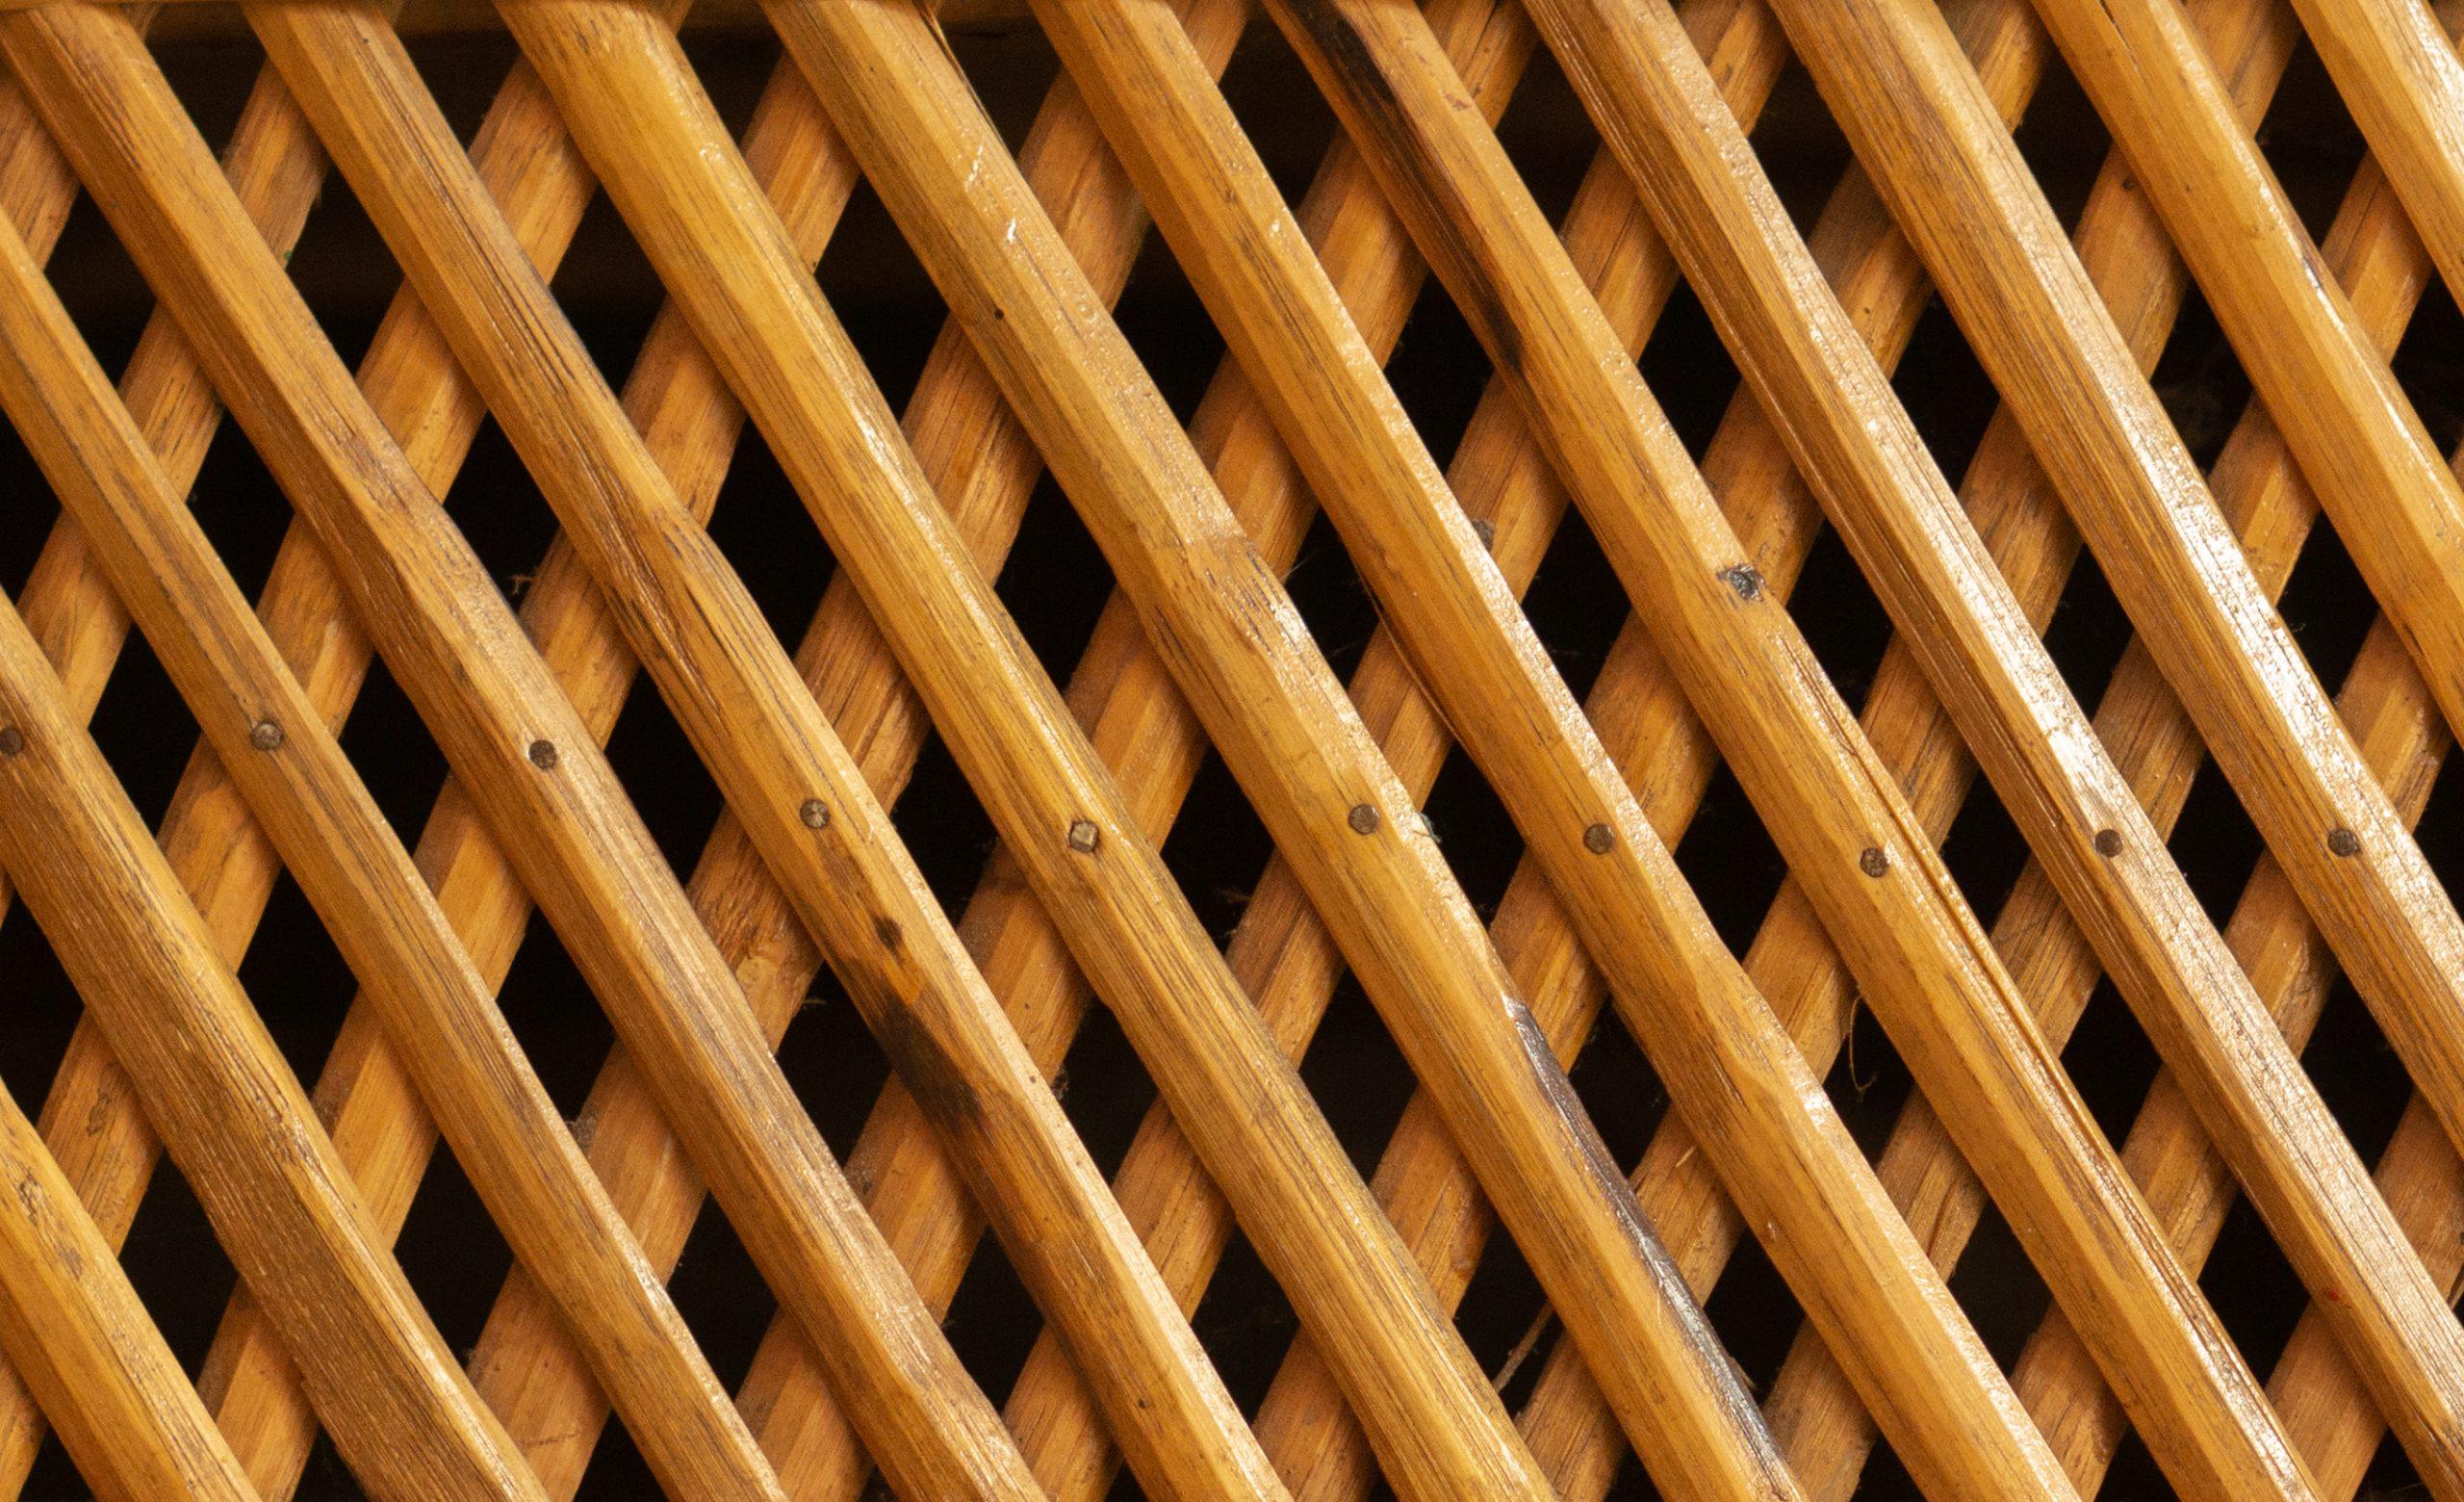 A Bamboo Mesh